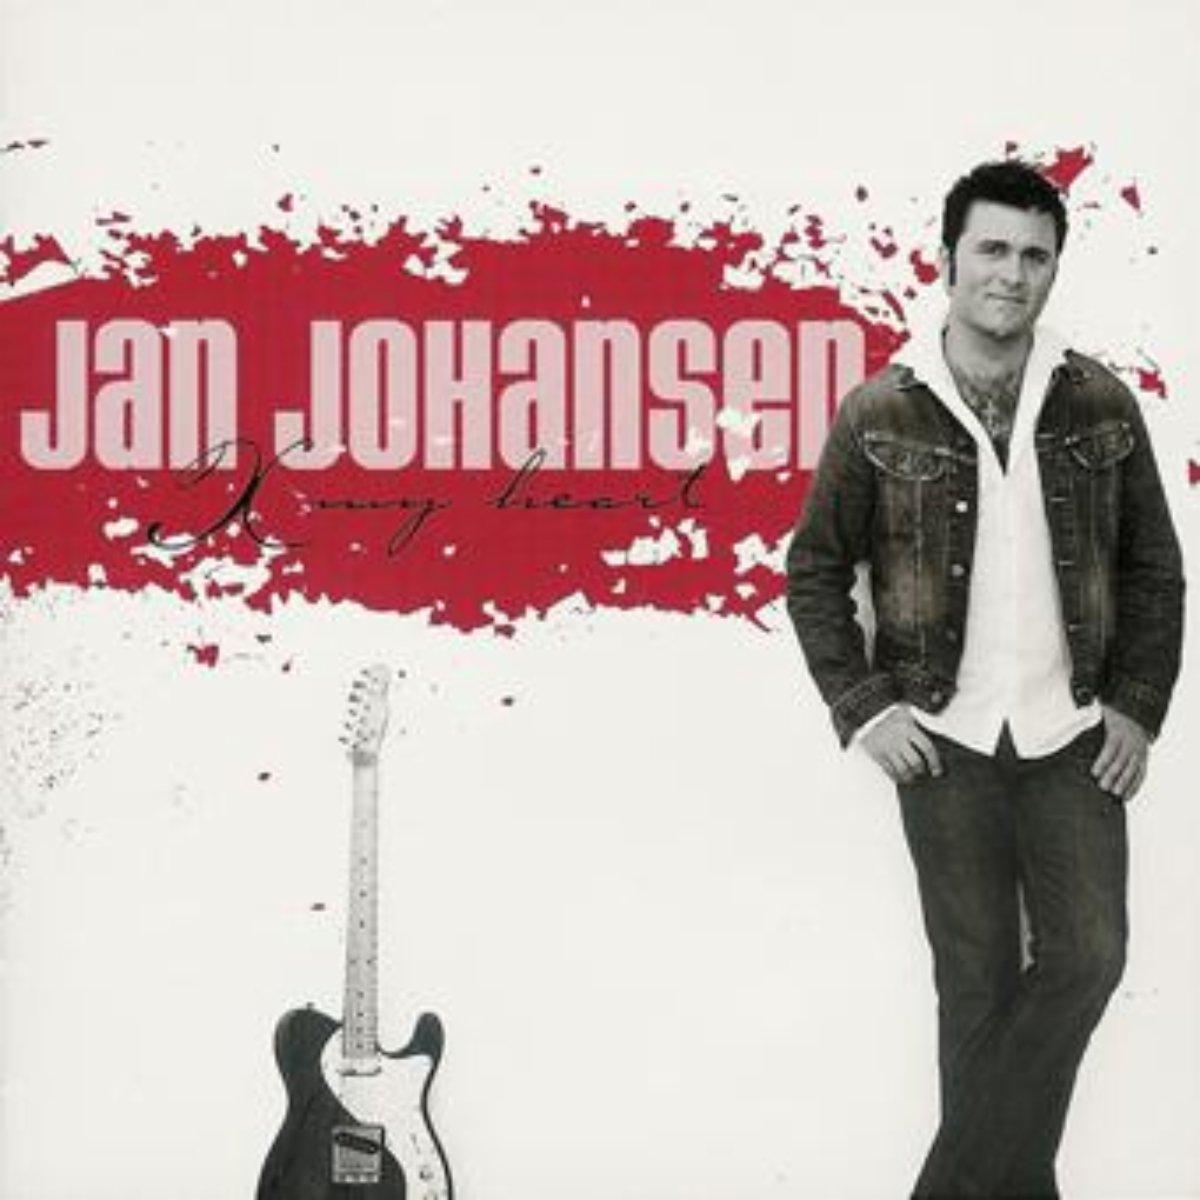 Jan Johansen - X My Heart (2003) [FLAC] Download